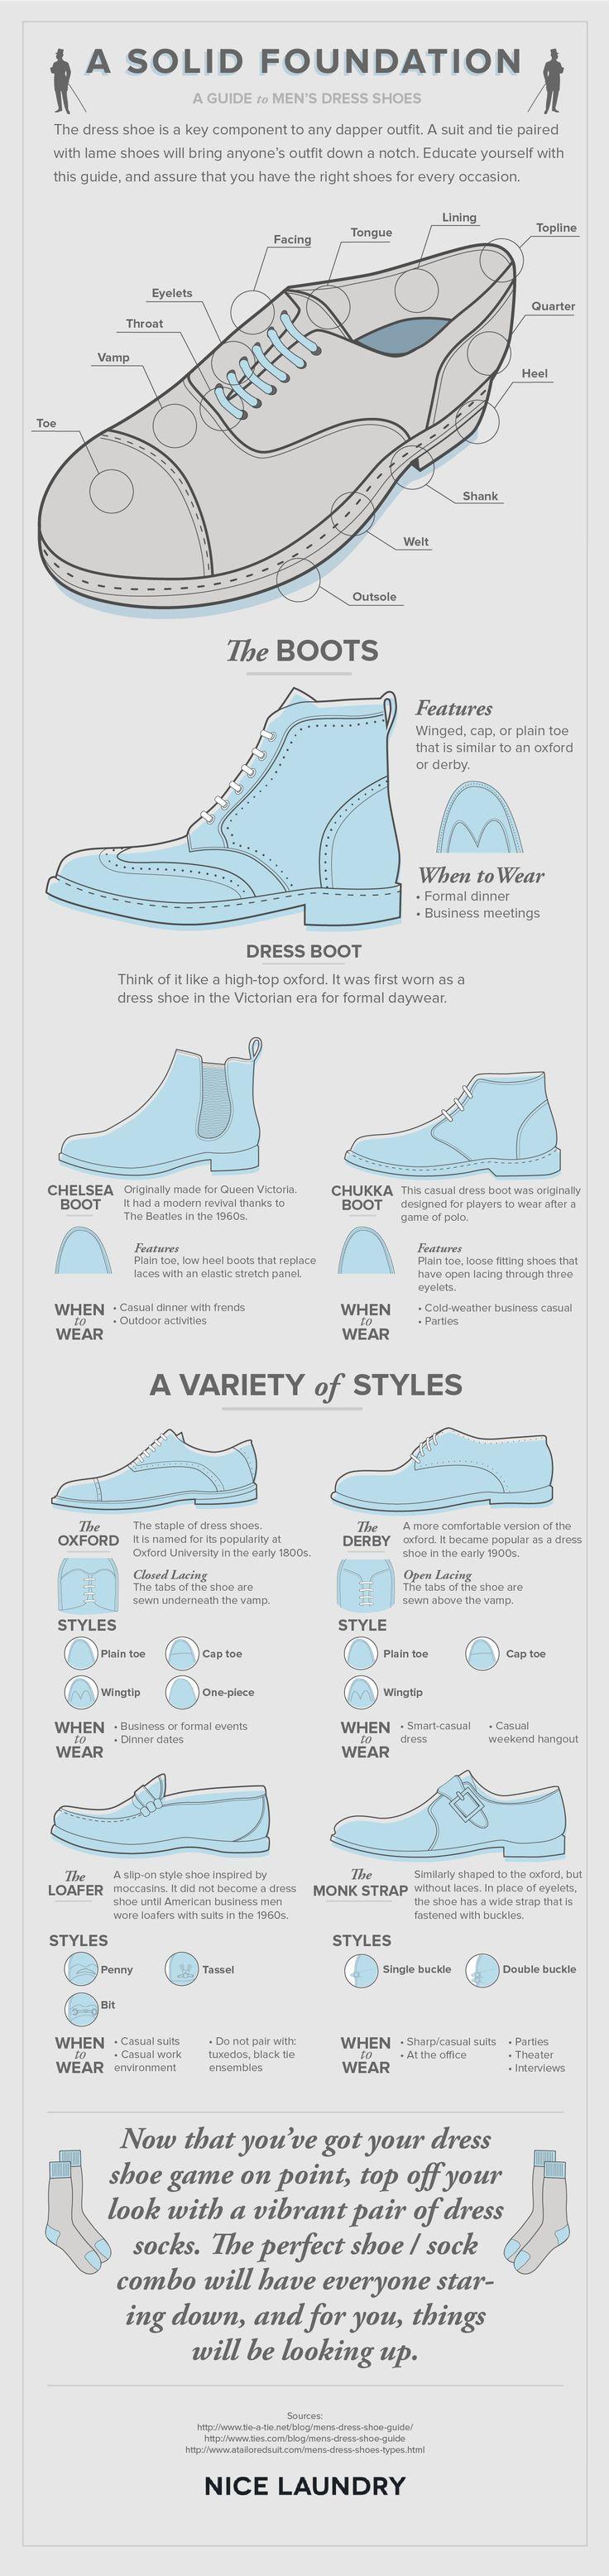 Pin by Gentlemans Essentials on Gentleman's Shoes | Pinterest